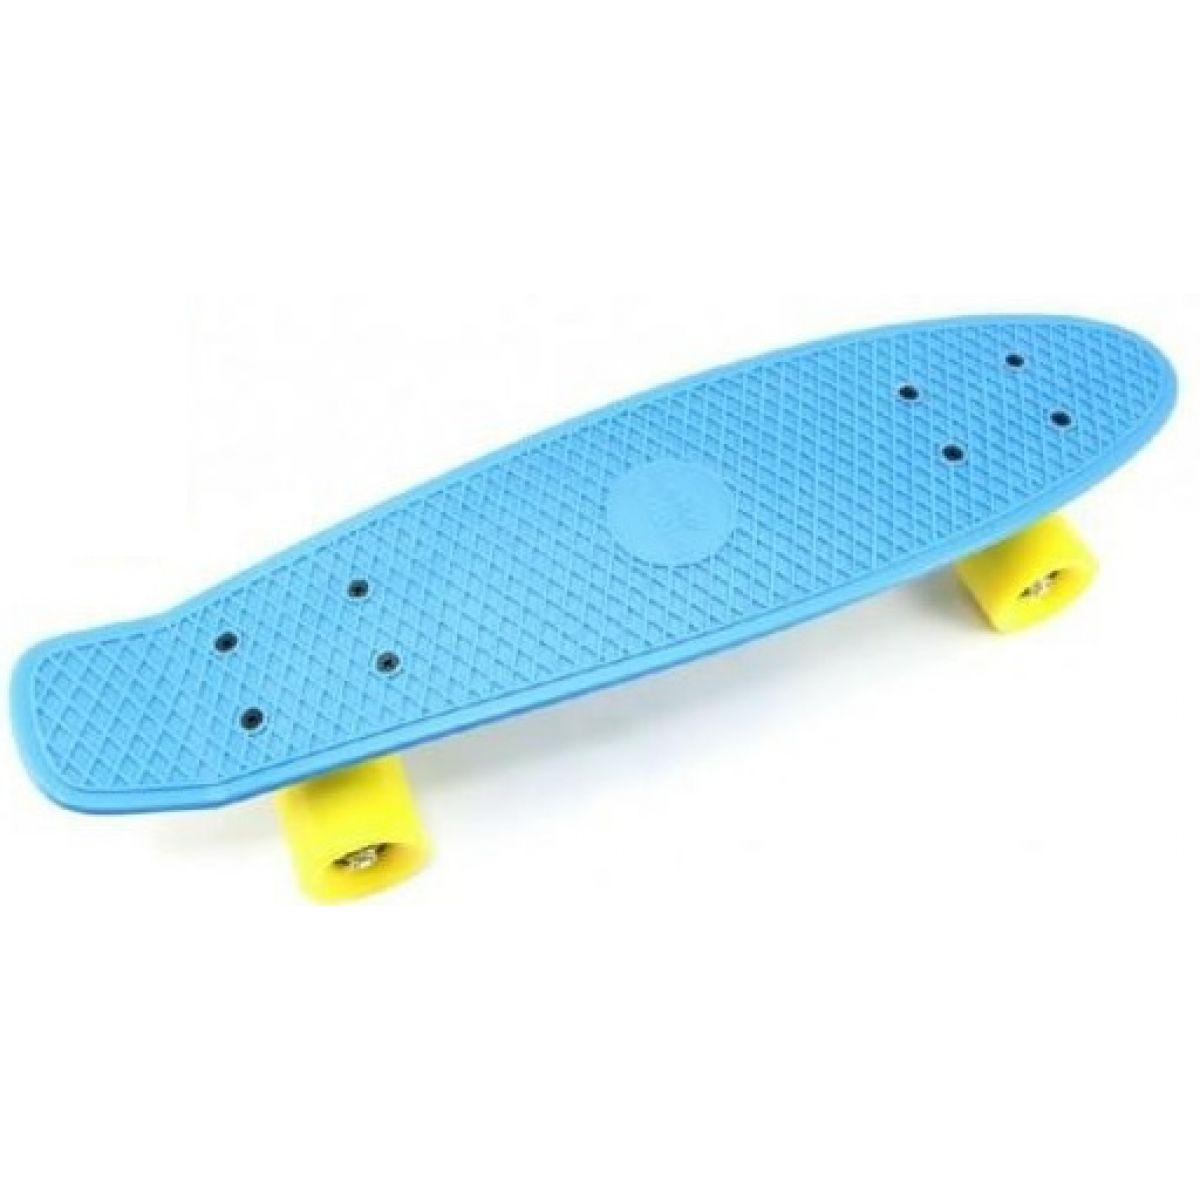 Skateboard pennyboard 60cm 40068